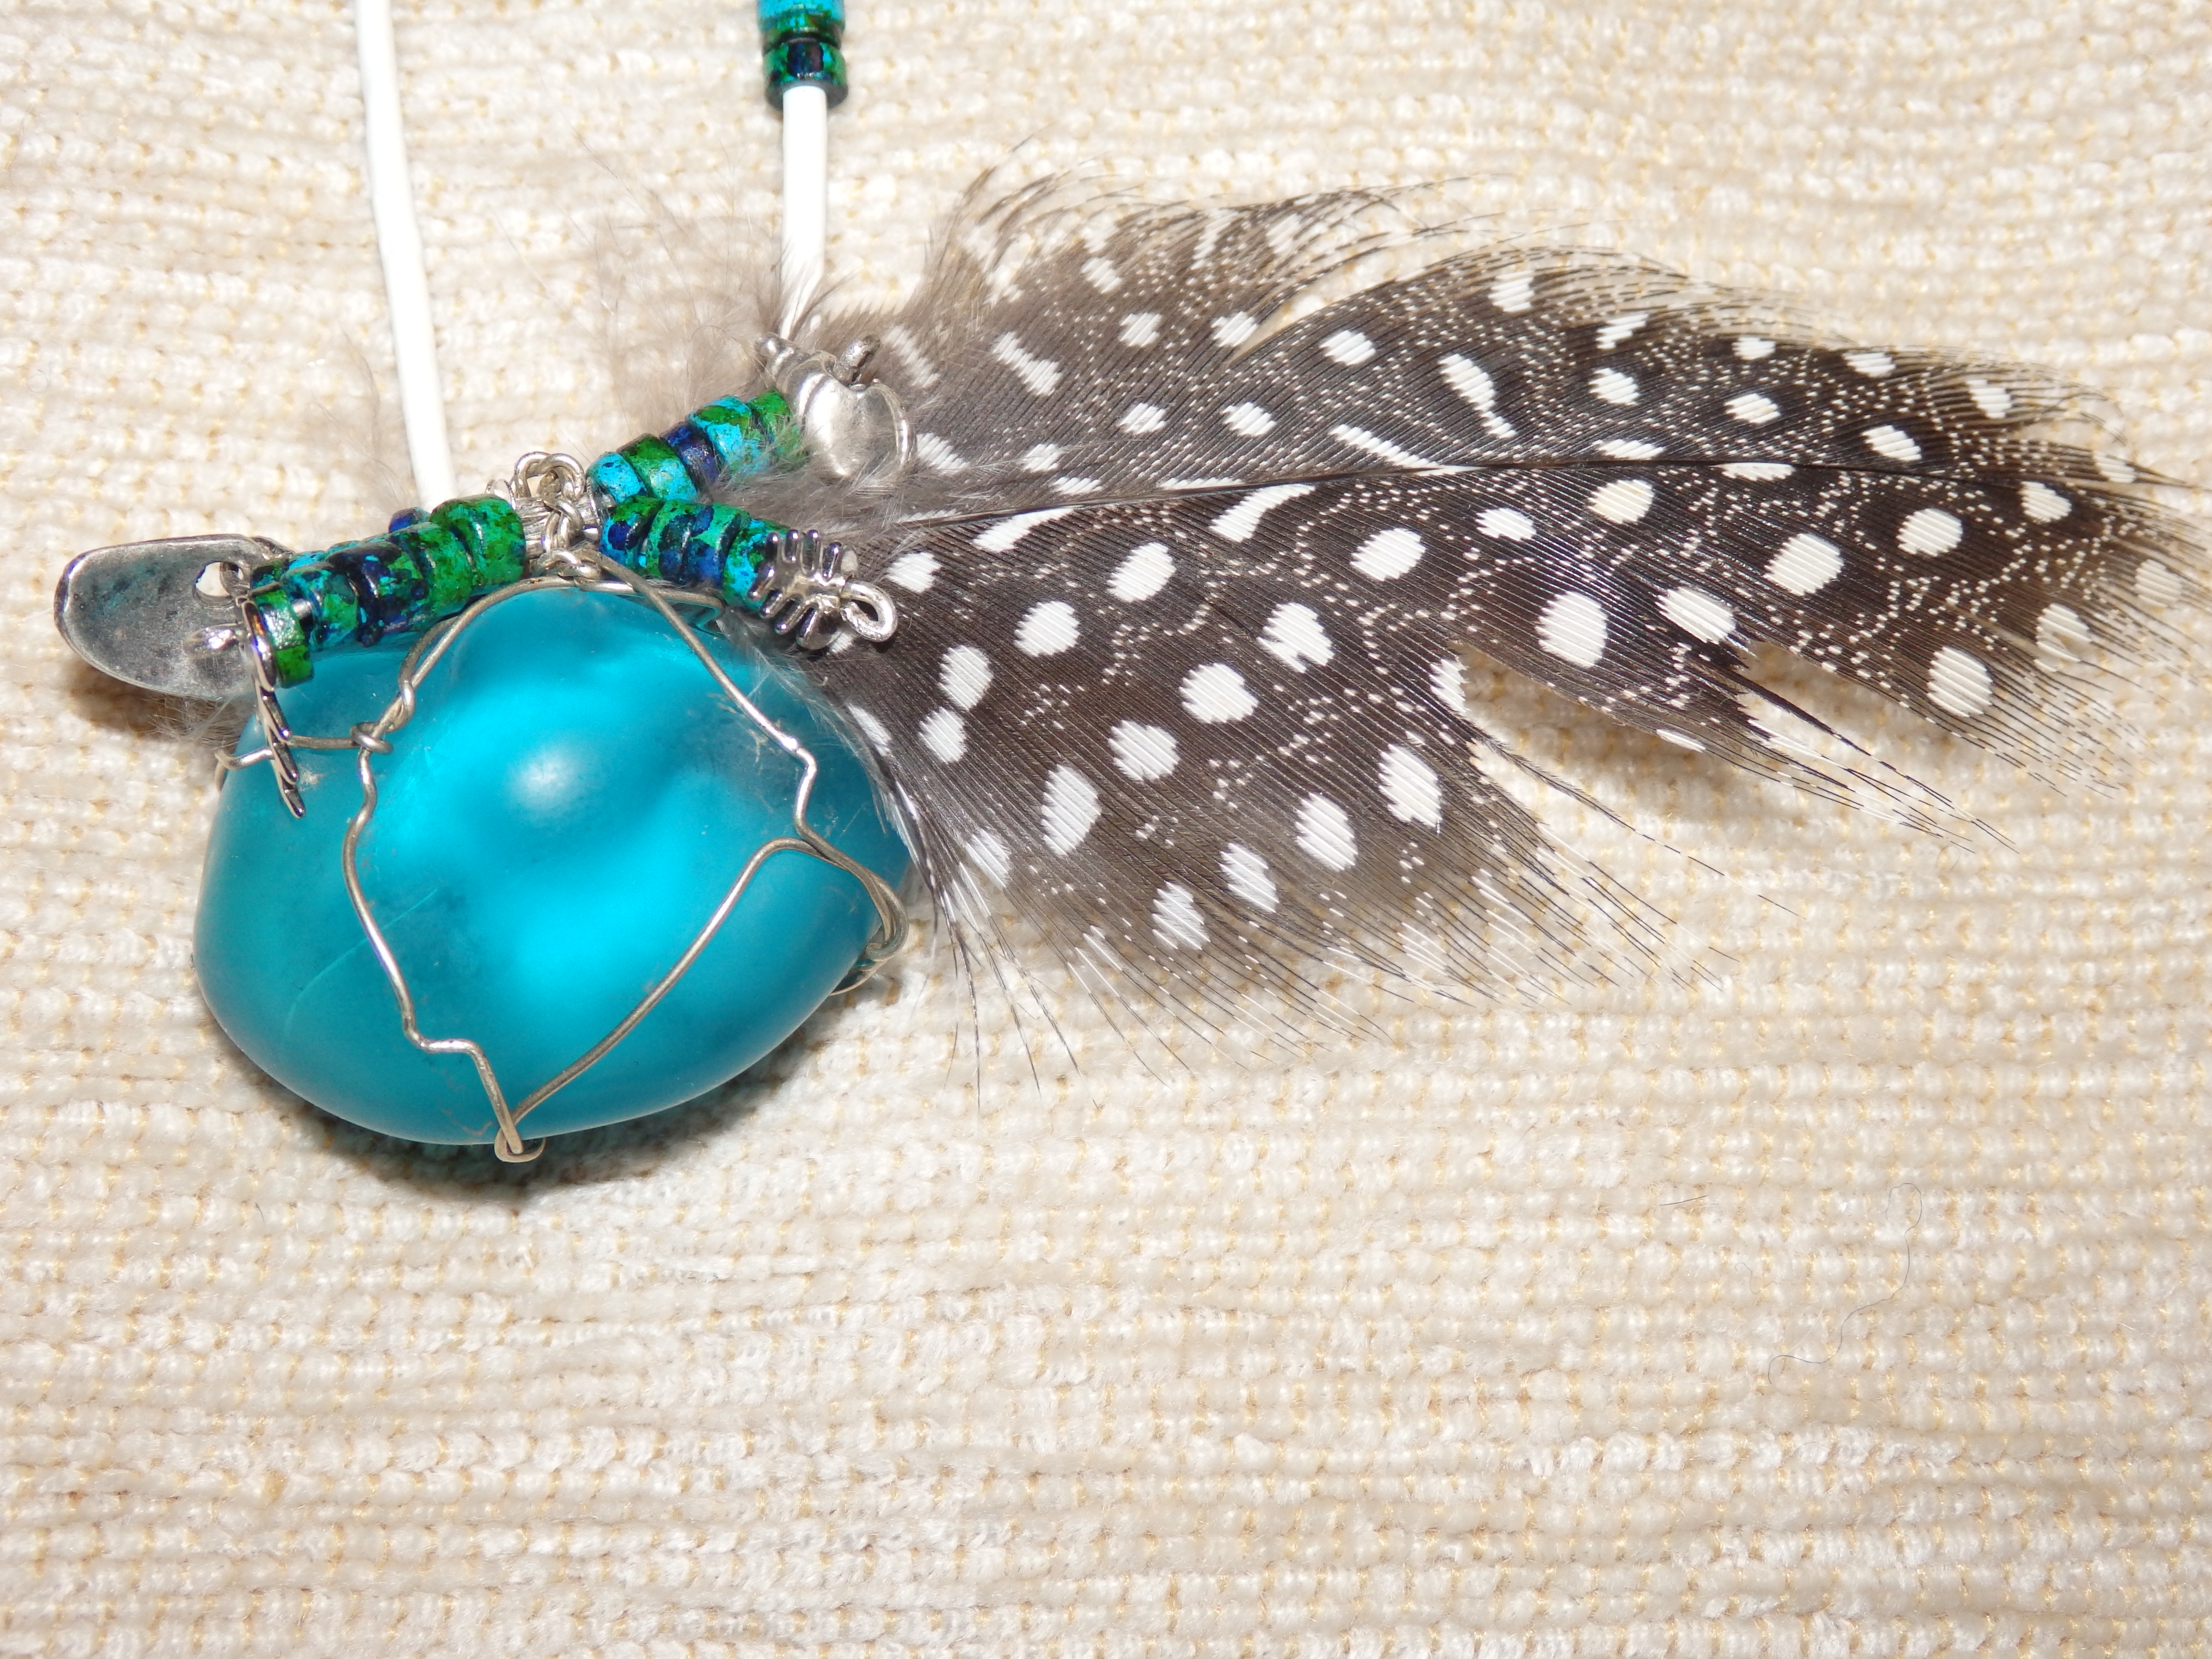 Semi-precious stone jewel